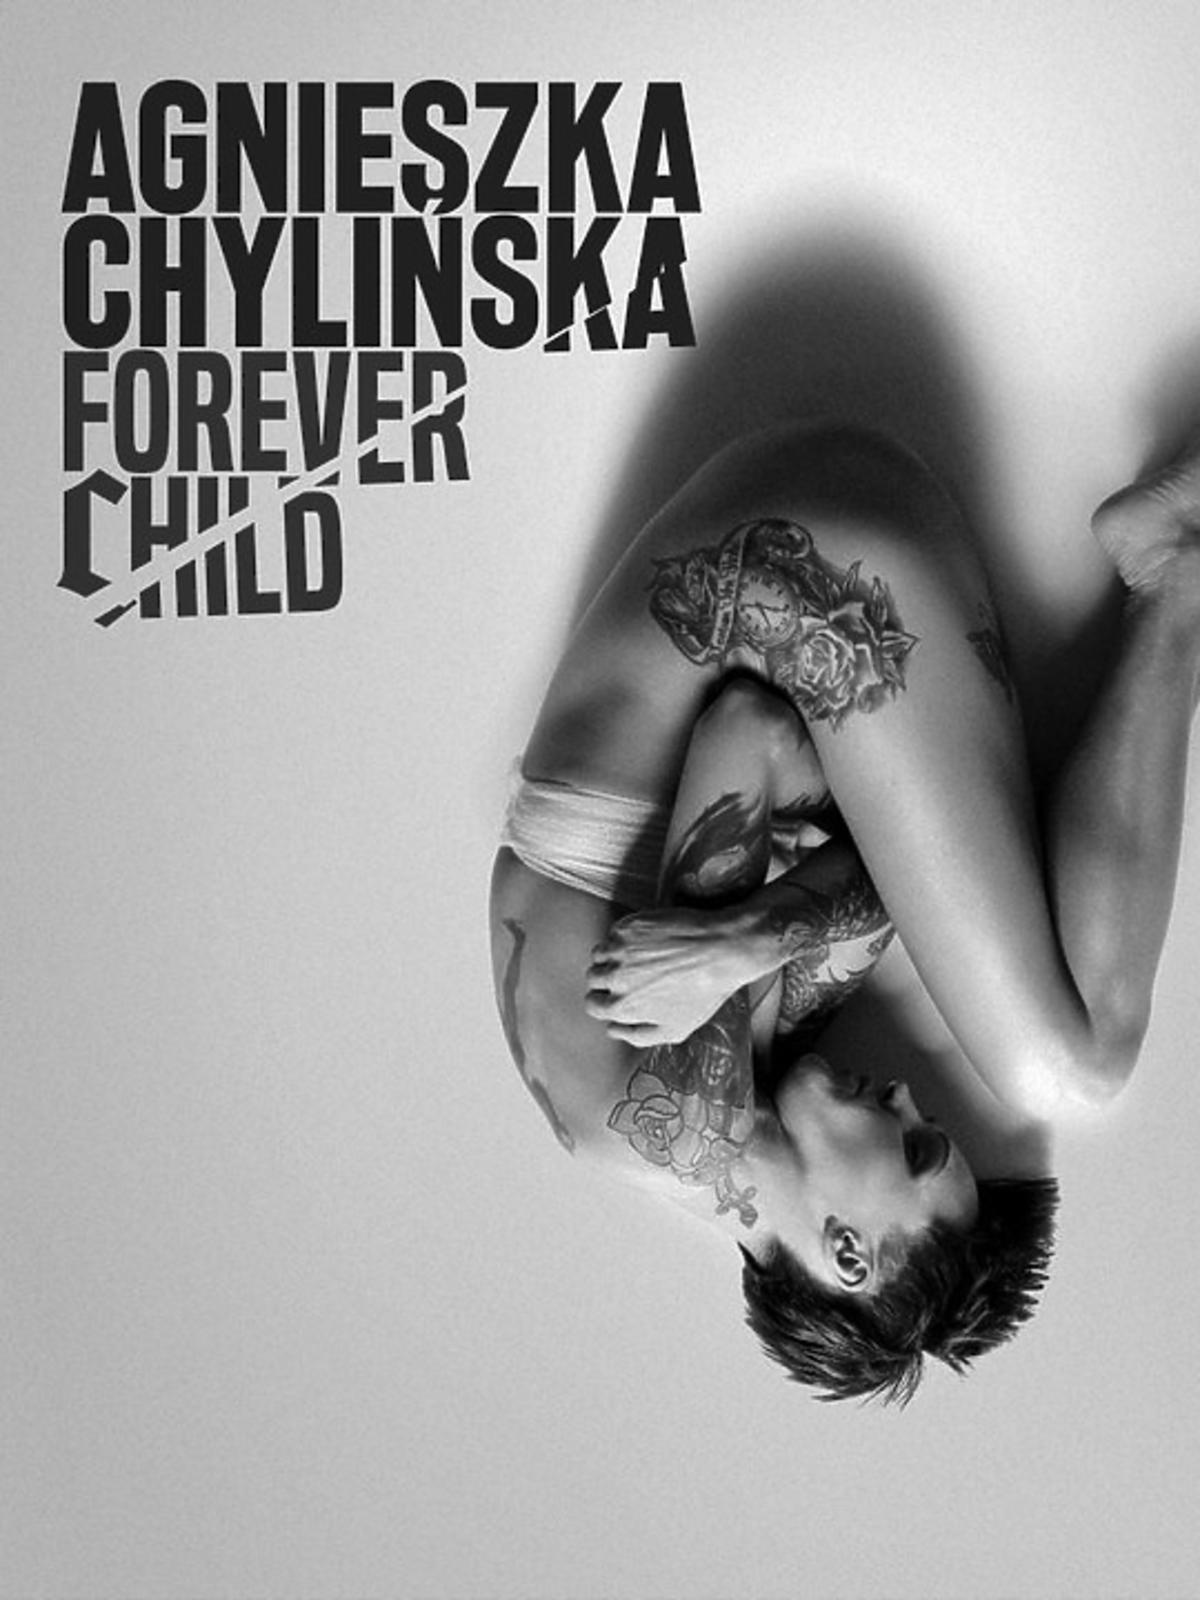 Agnieszka Chylińska - Forever Child